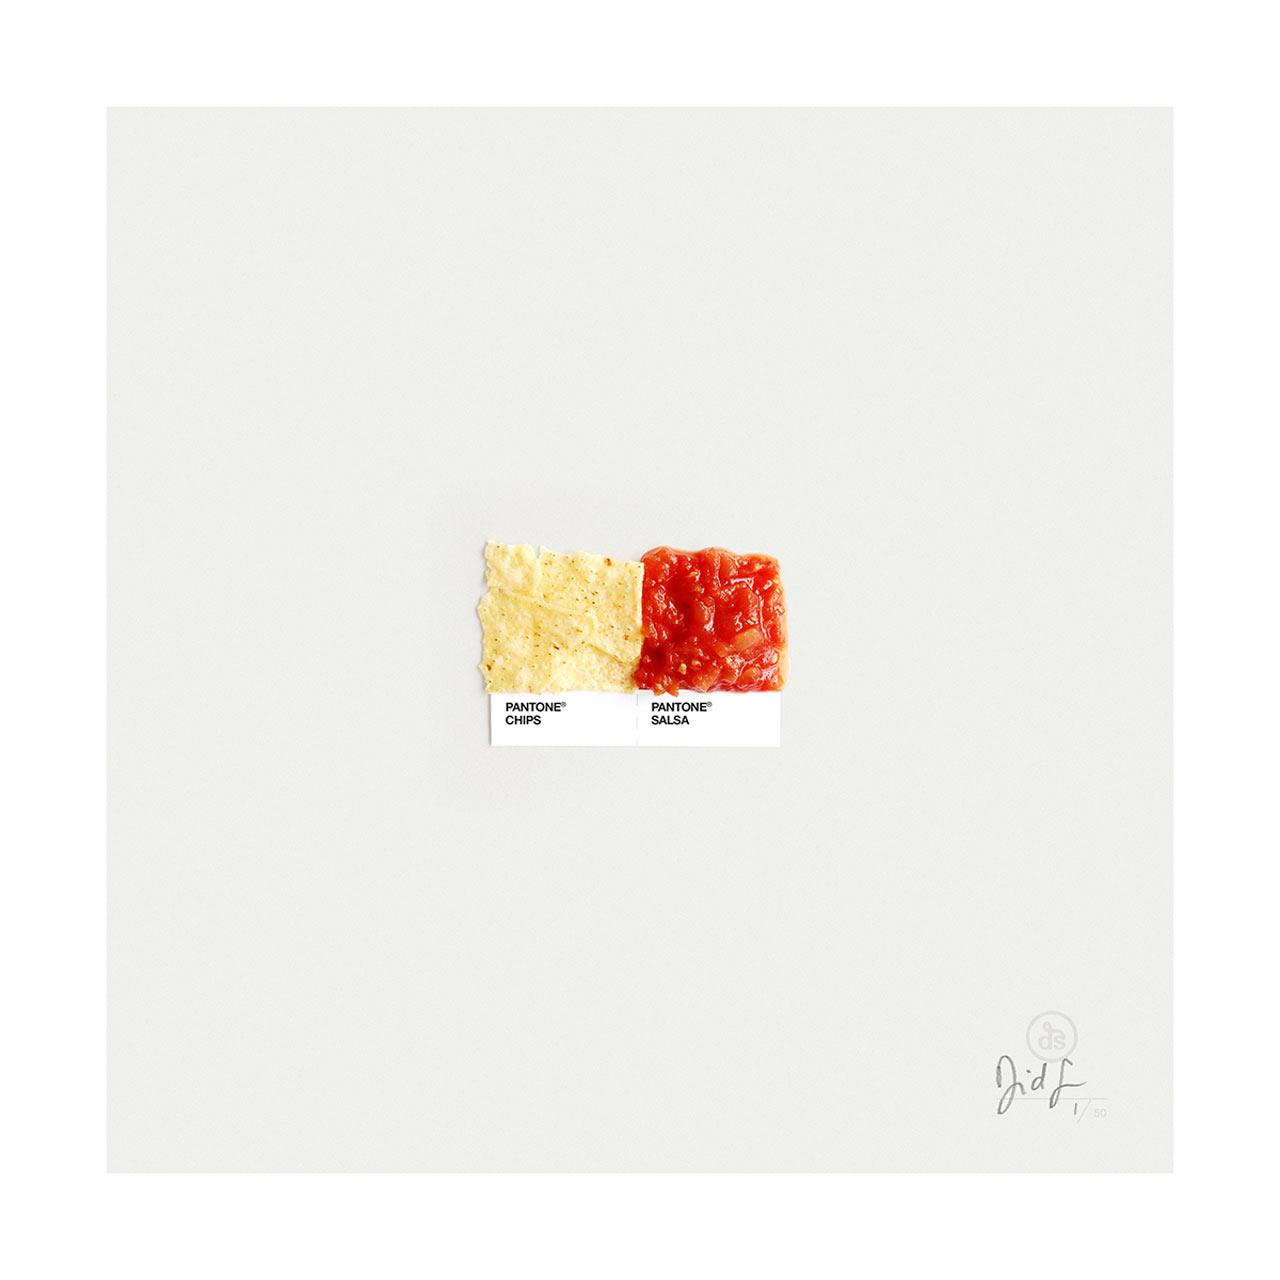 Pantone-Pairings-12_chips_salsa